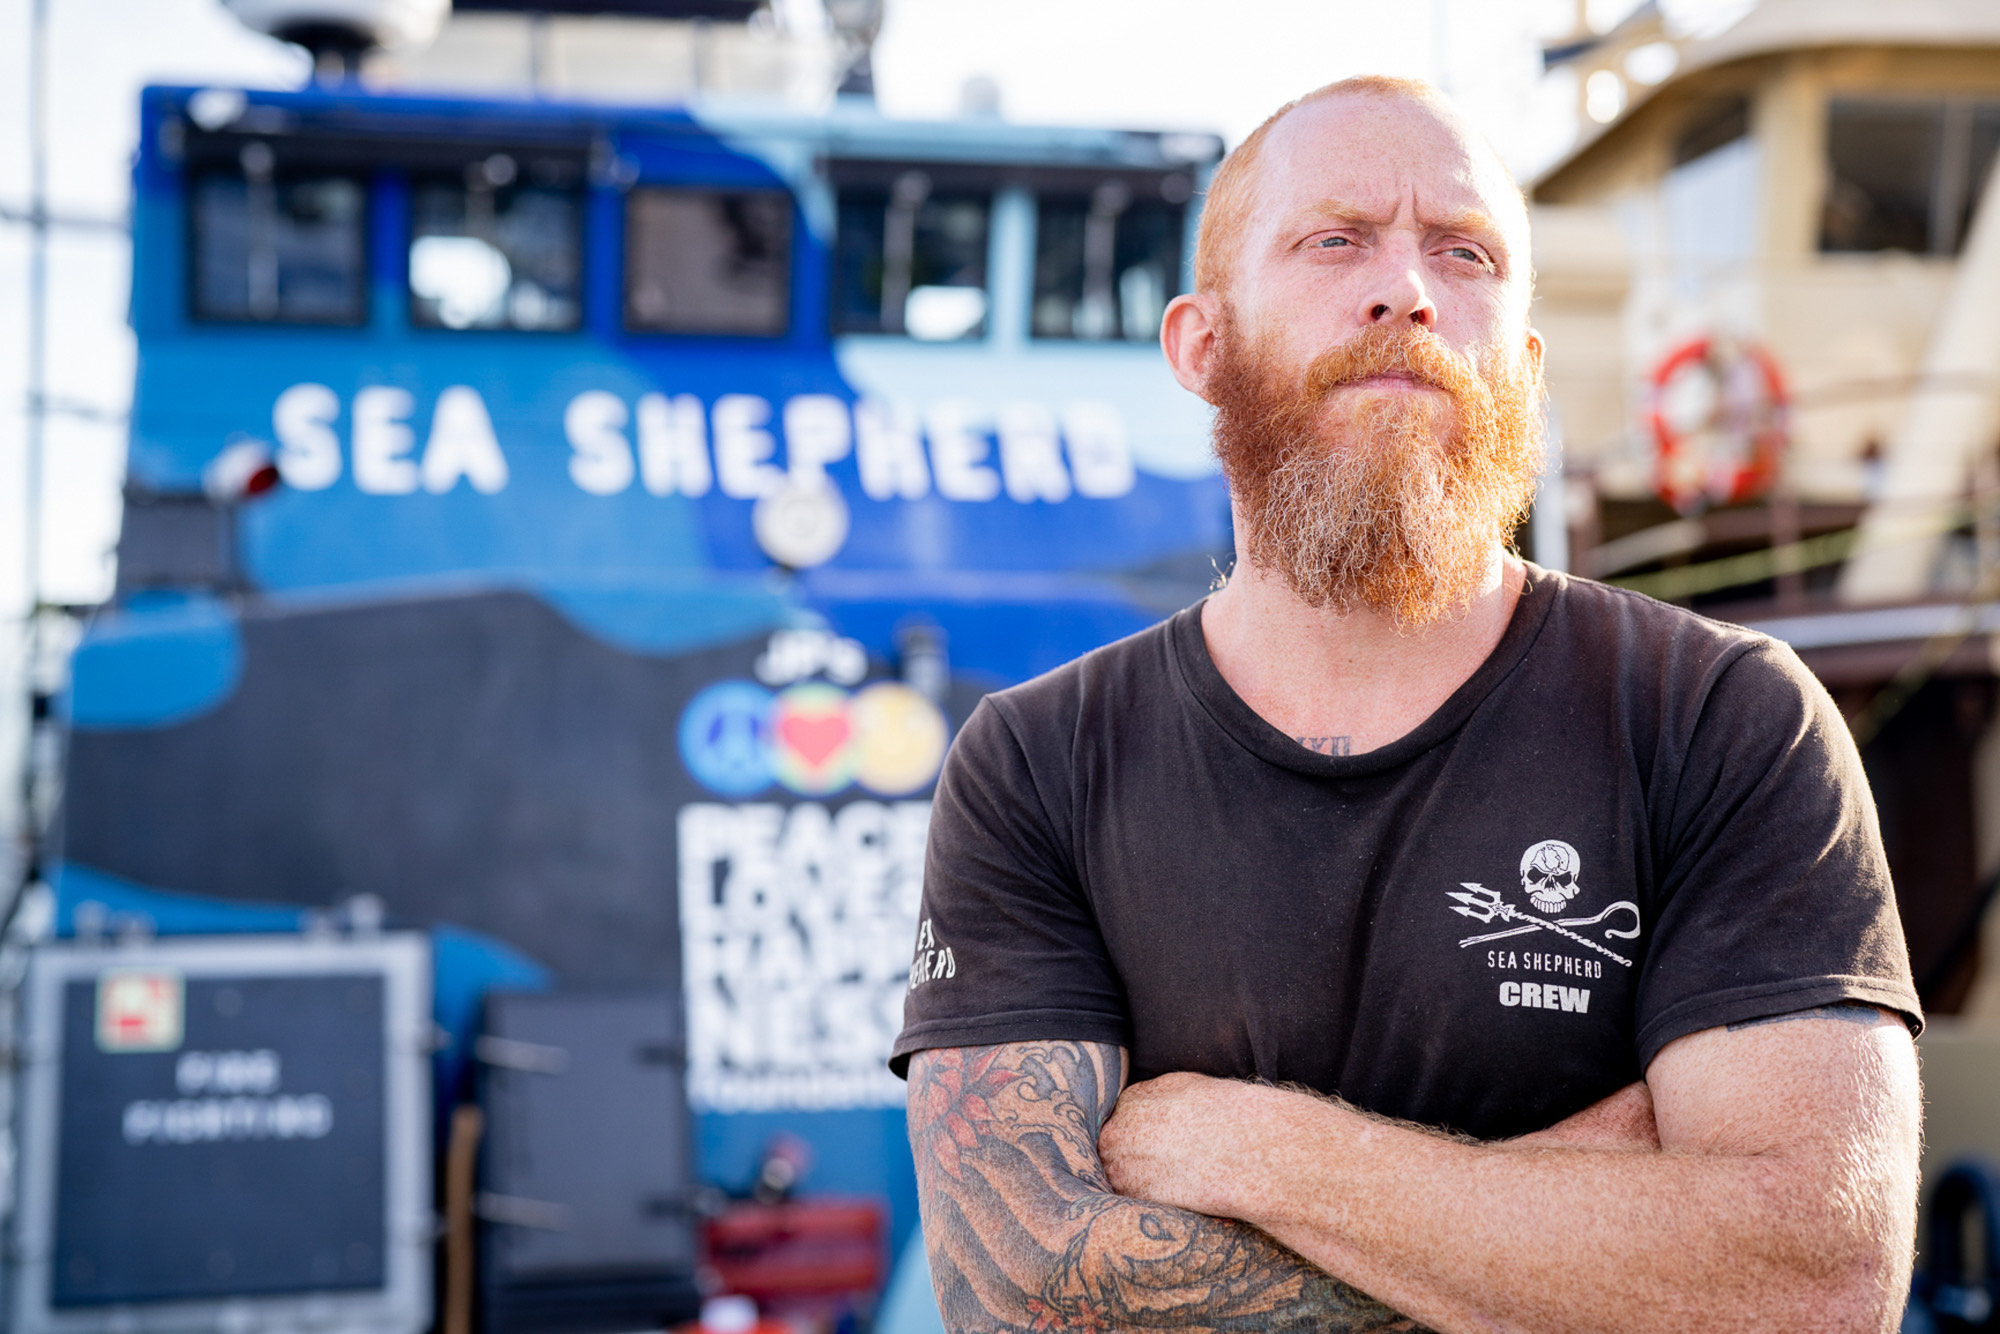 sea-shepherd-bosun-headshot-1 SEA SHEPHERD